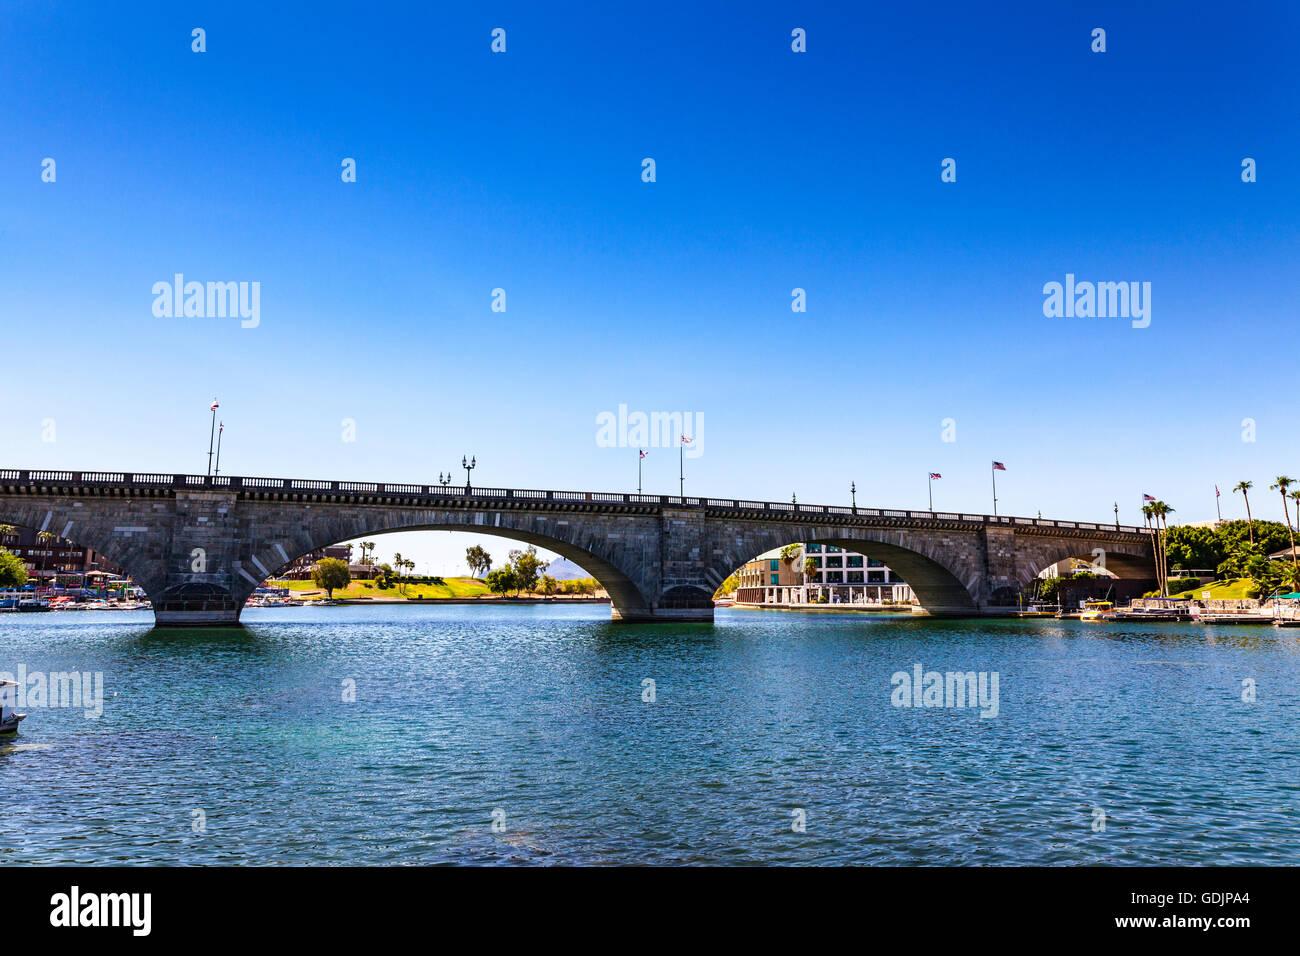 London Bridge In Lake Havasu City Arizona A Popular Party Place On Stock Photo Alamy